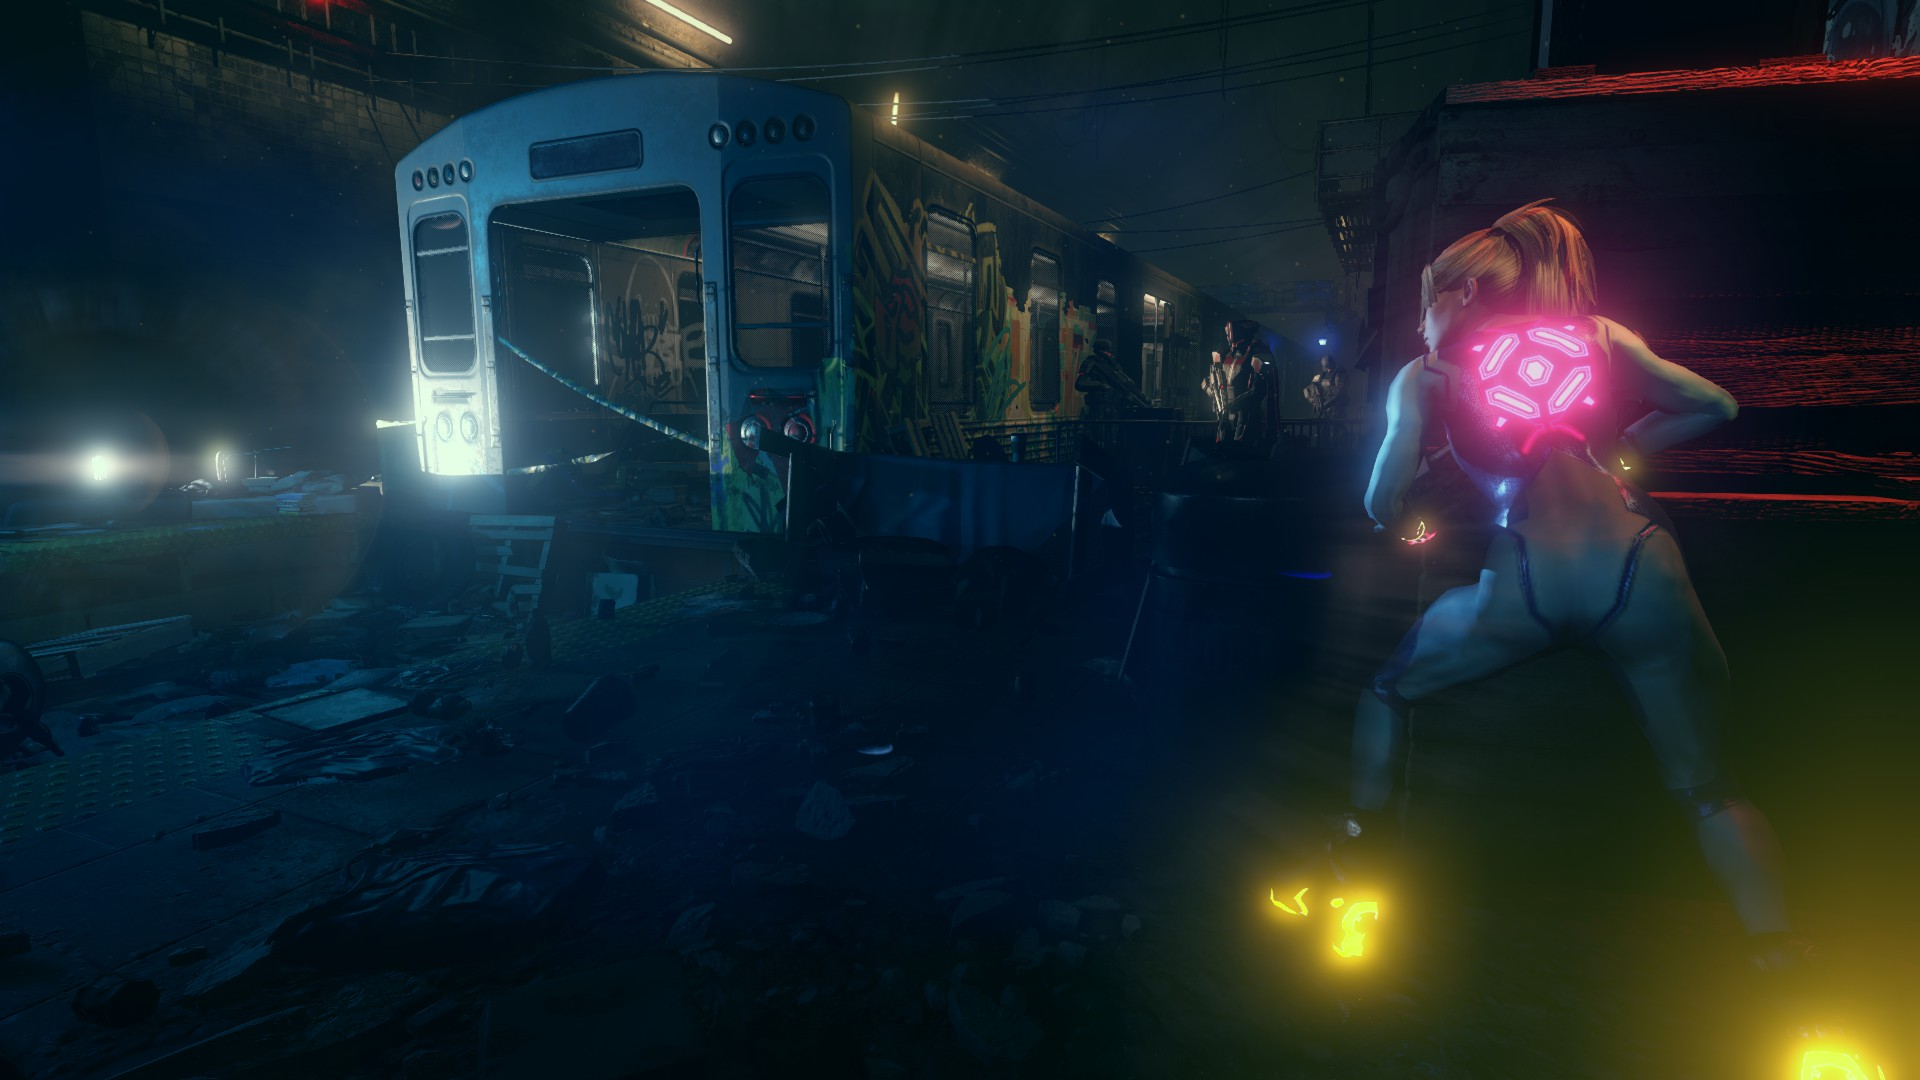 Steam Workshop :: [WotC] Super Smash Bros  Ultimate - Zero Suit Samus